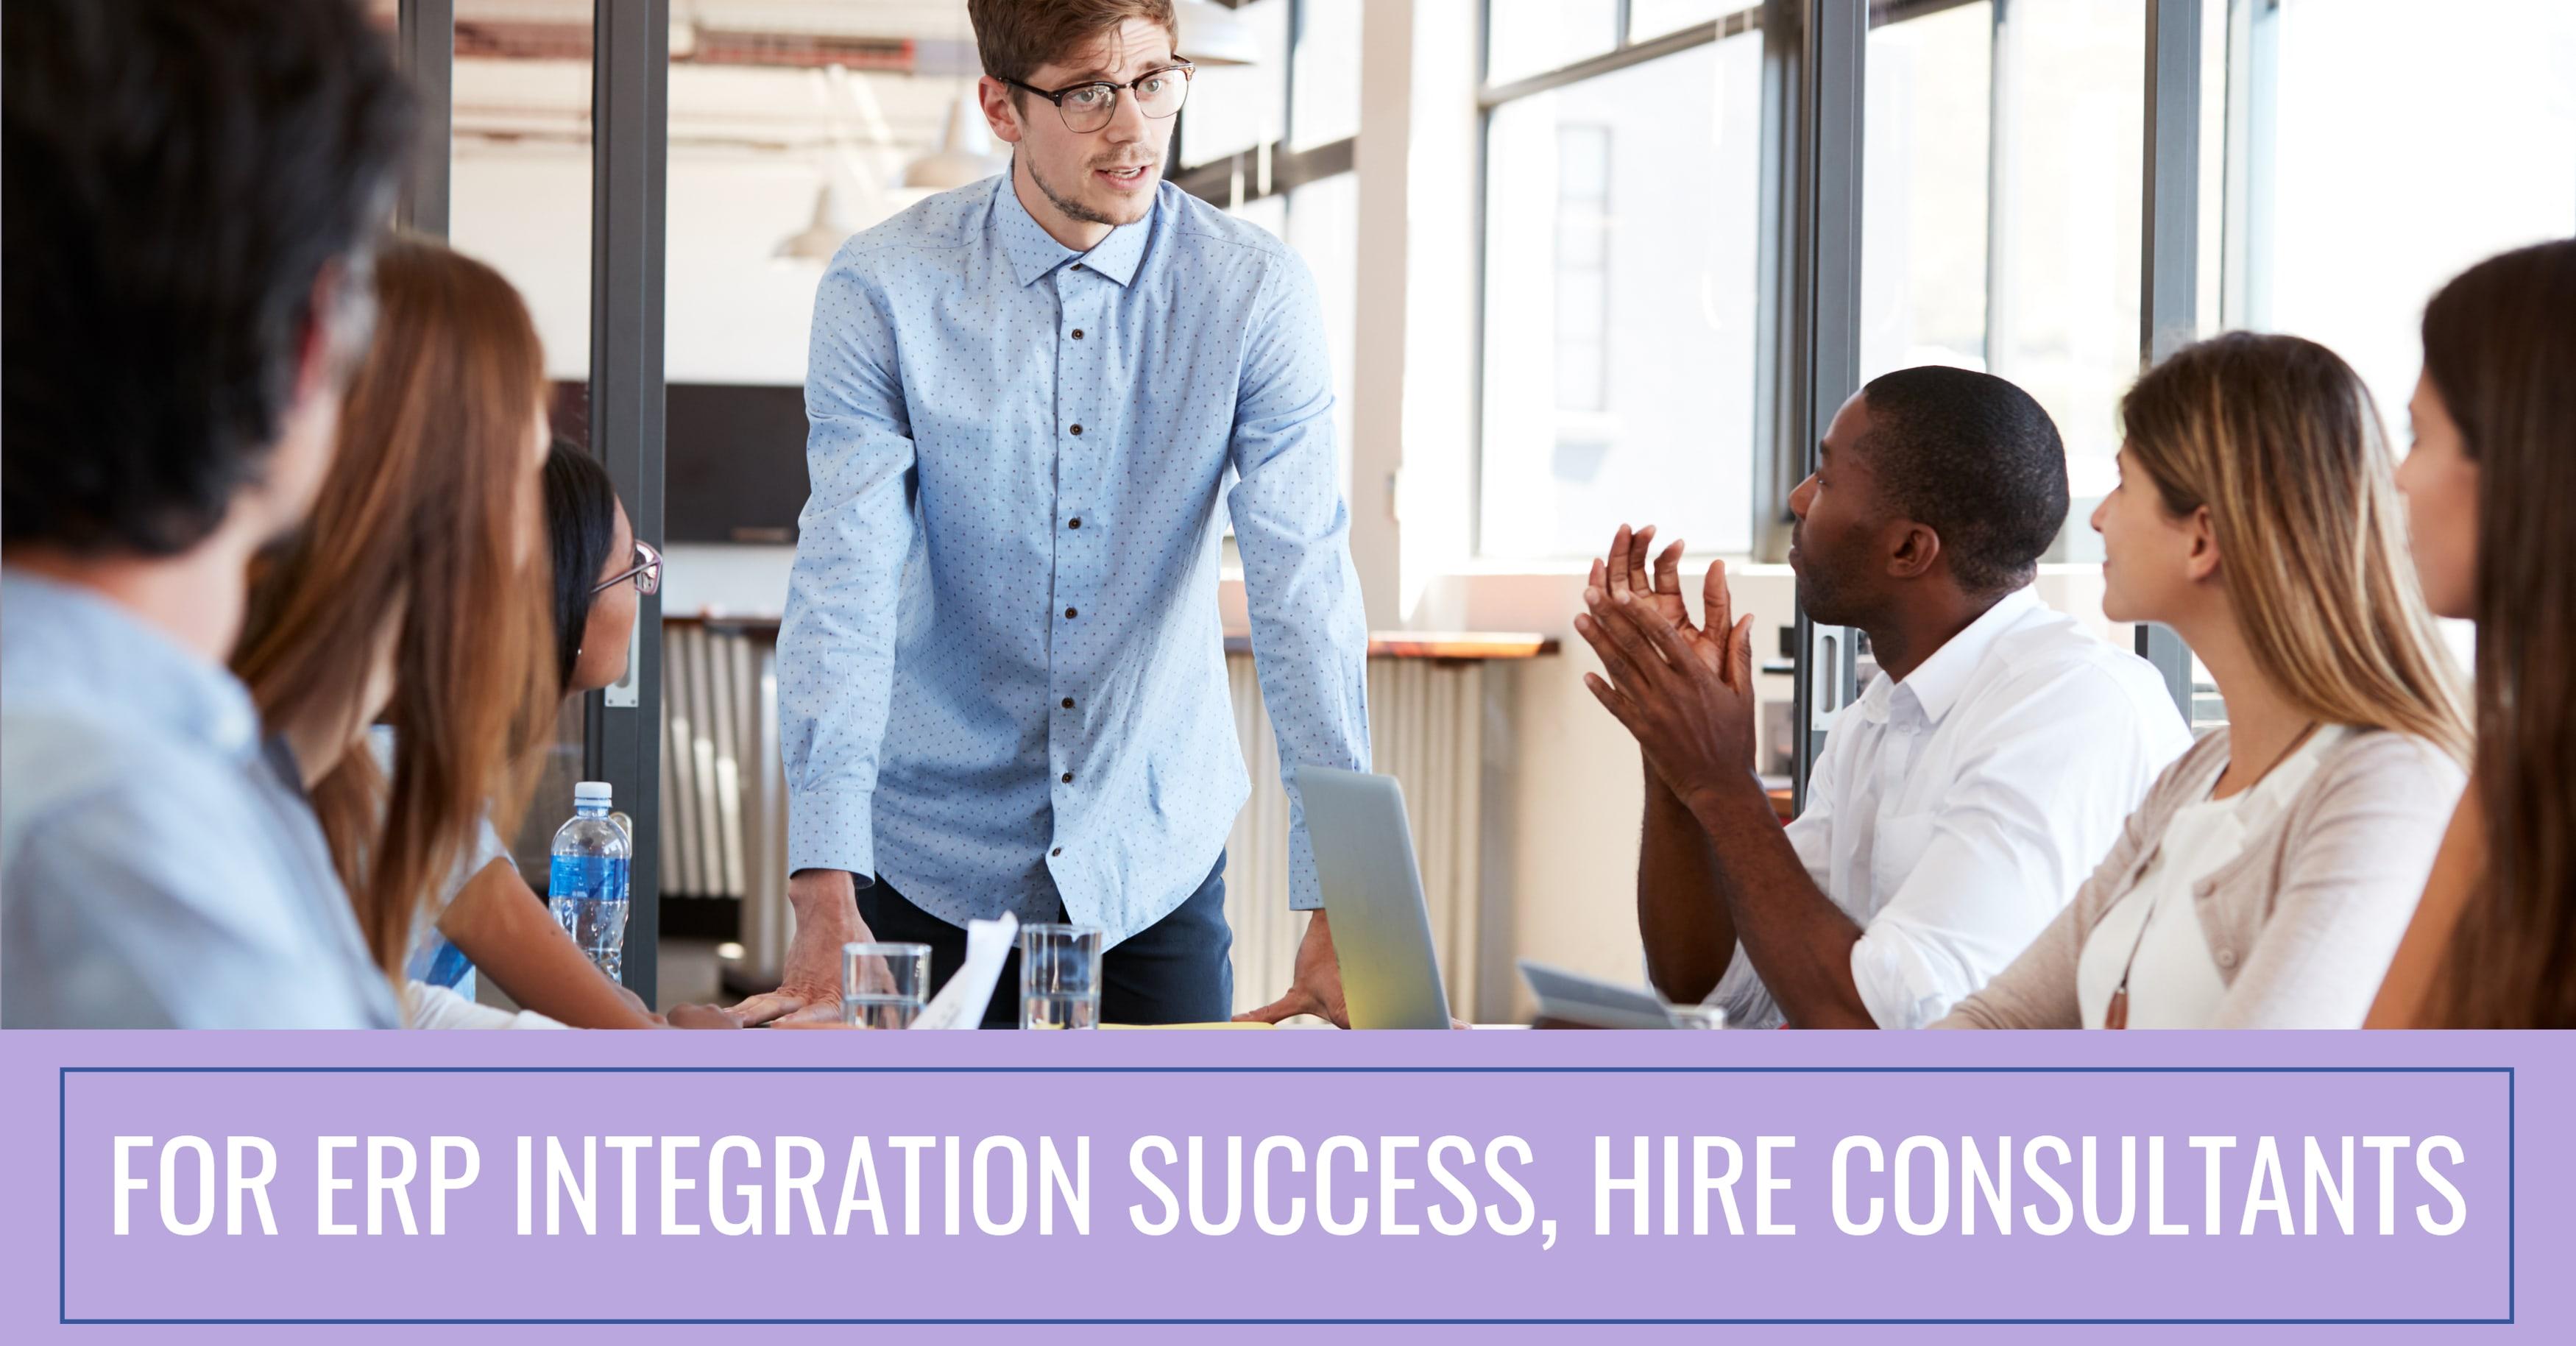 ERP Integration Consultants